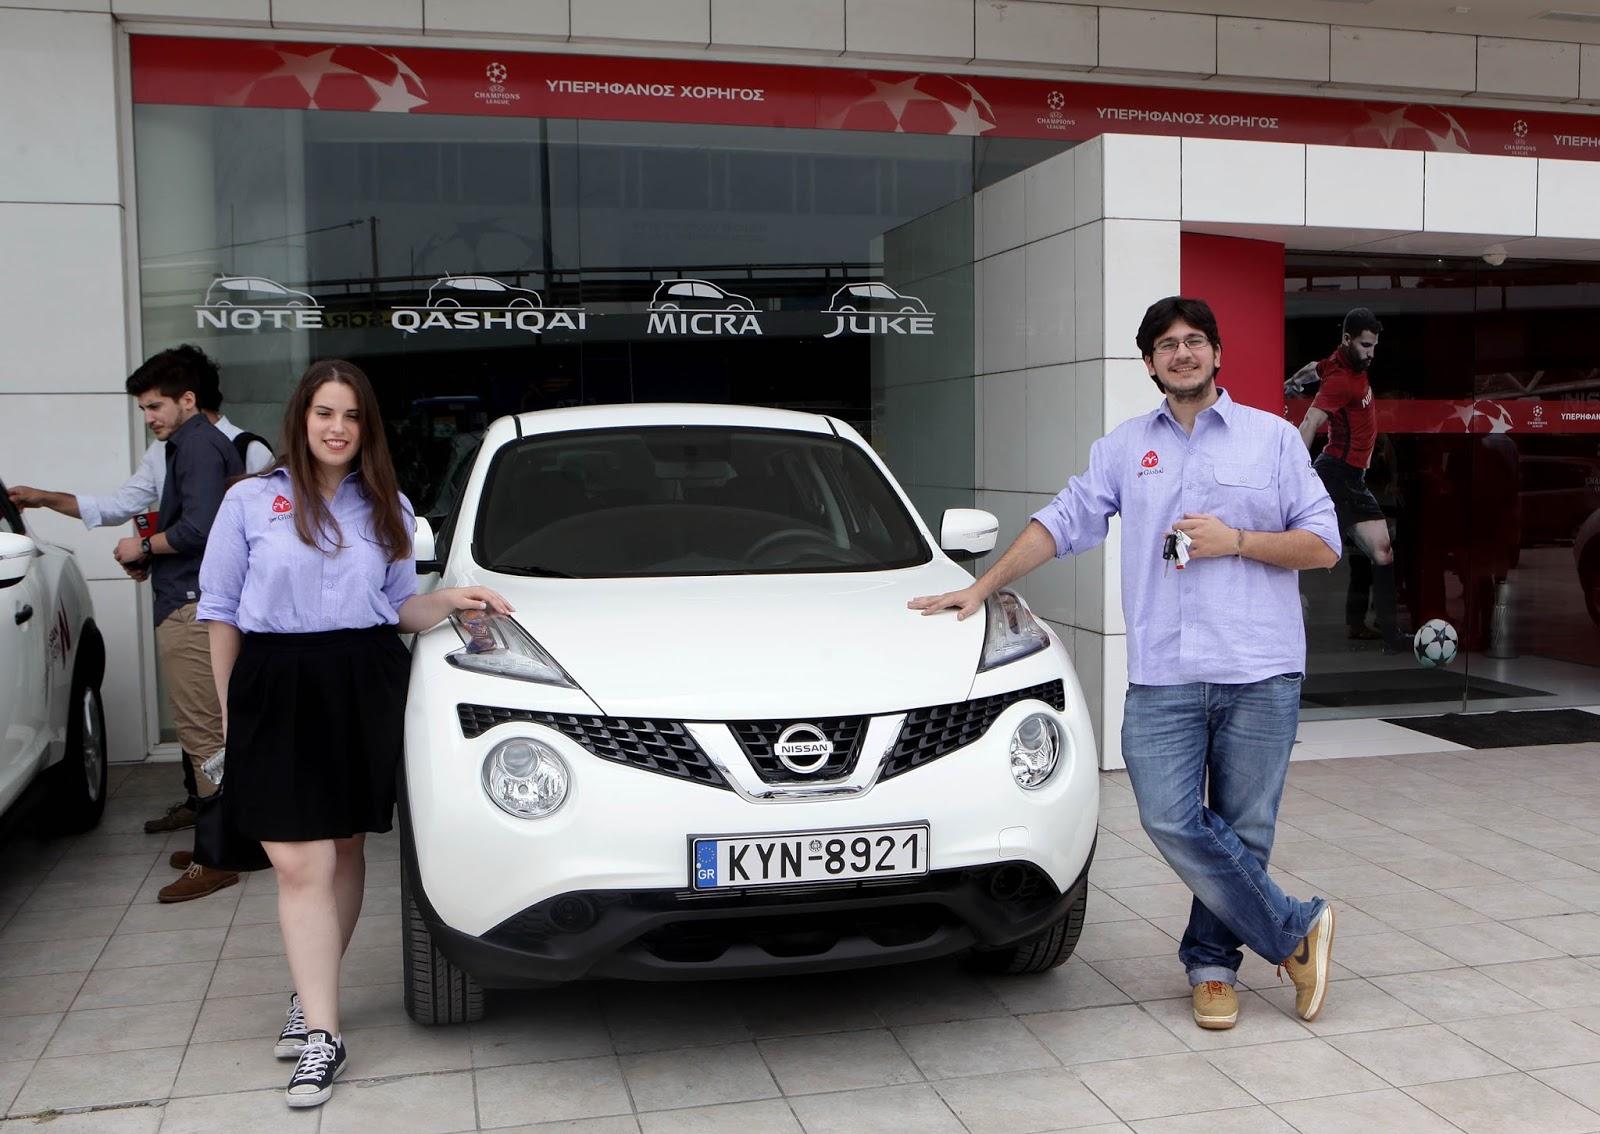 IMG 6142 Η Nissan βραβεύει με αυτοκίνητα του νικητές του GENERATION N ! Events, Future, Innovation, Nissan